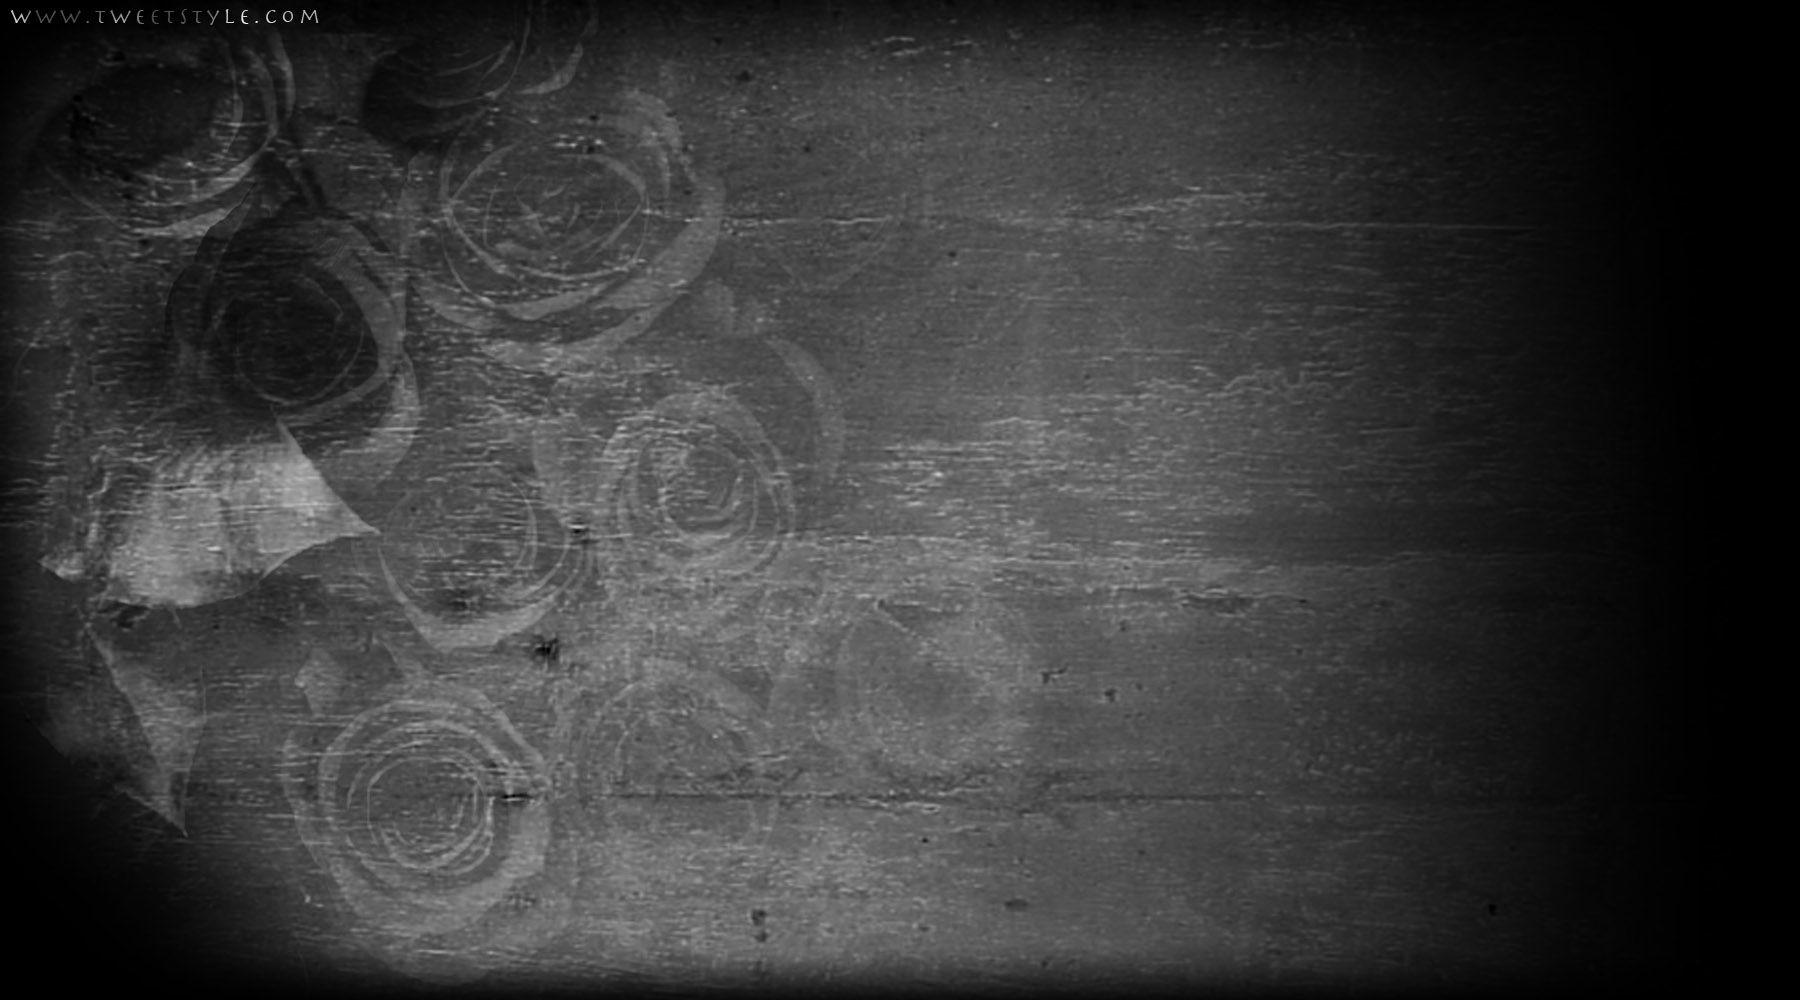 Background black boxes parisvega com cool back 1800x1000 332 background black boxes parisvega com cool back 1800x1000 332 hdewallpaper voltagebd Images